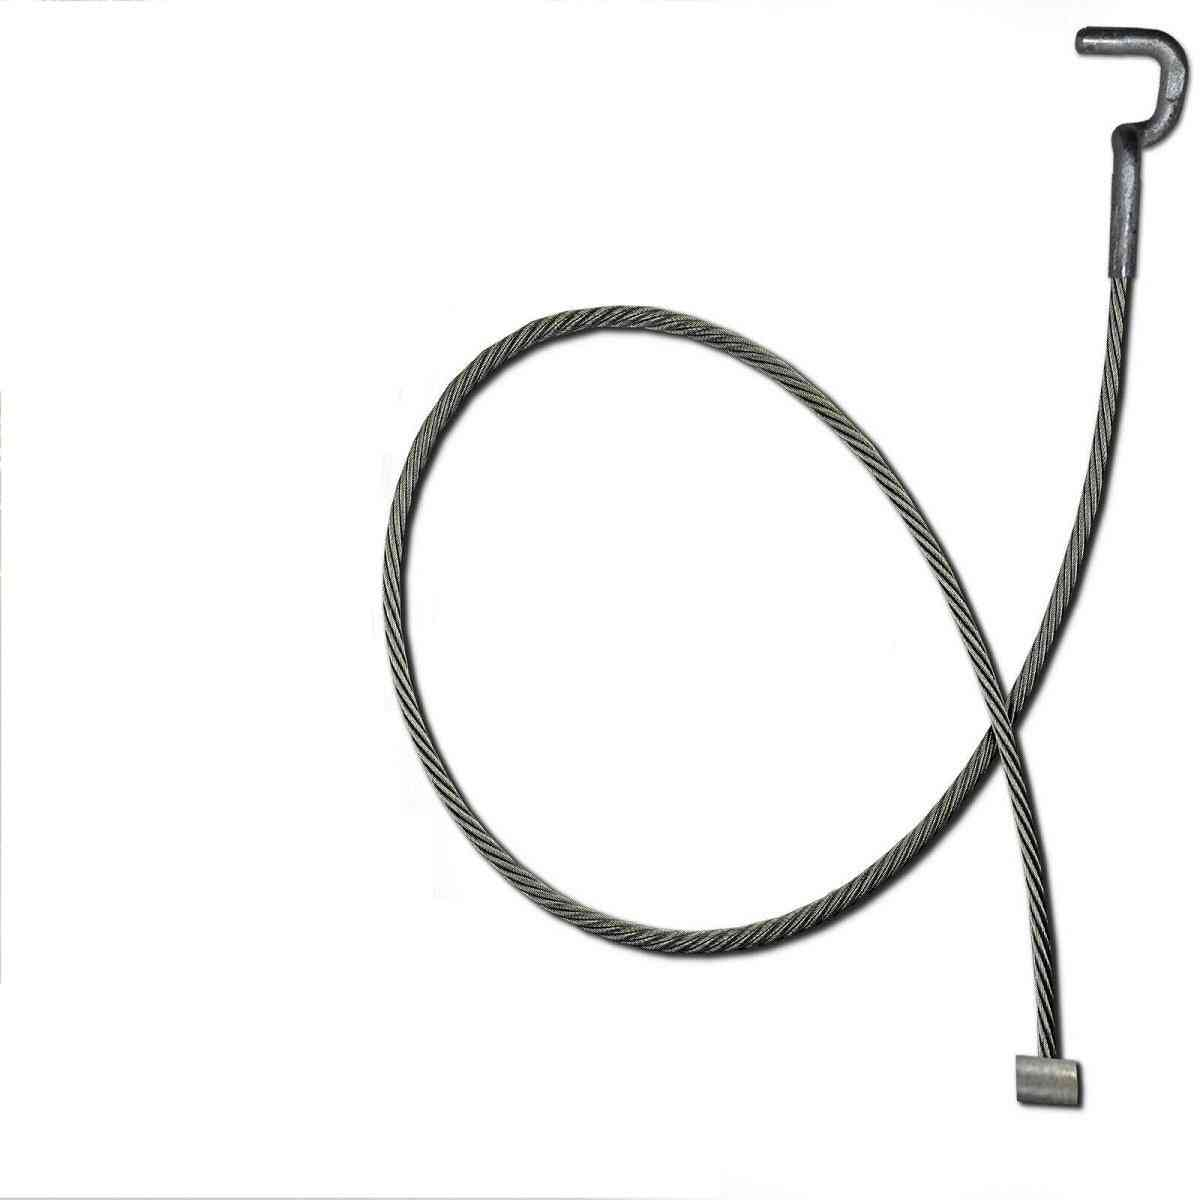 Handbrake Handle/lever Release Cable